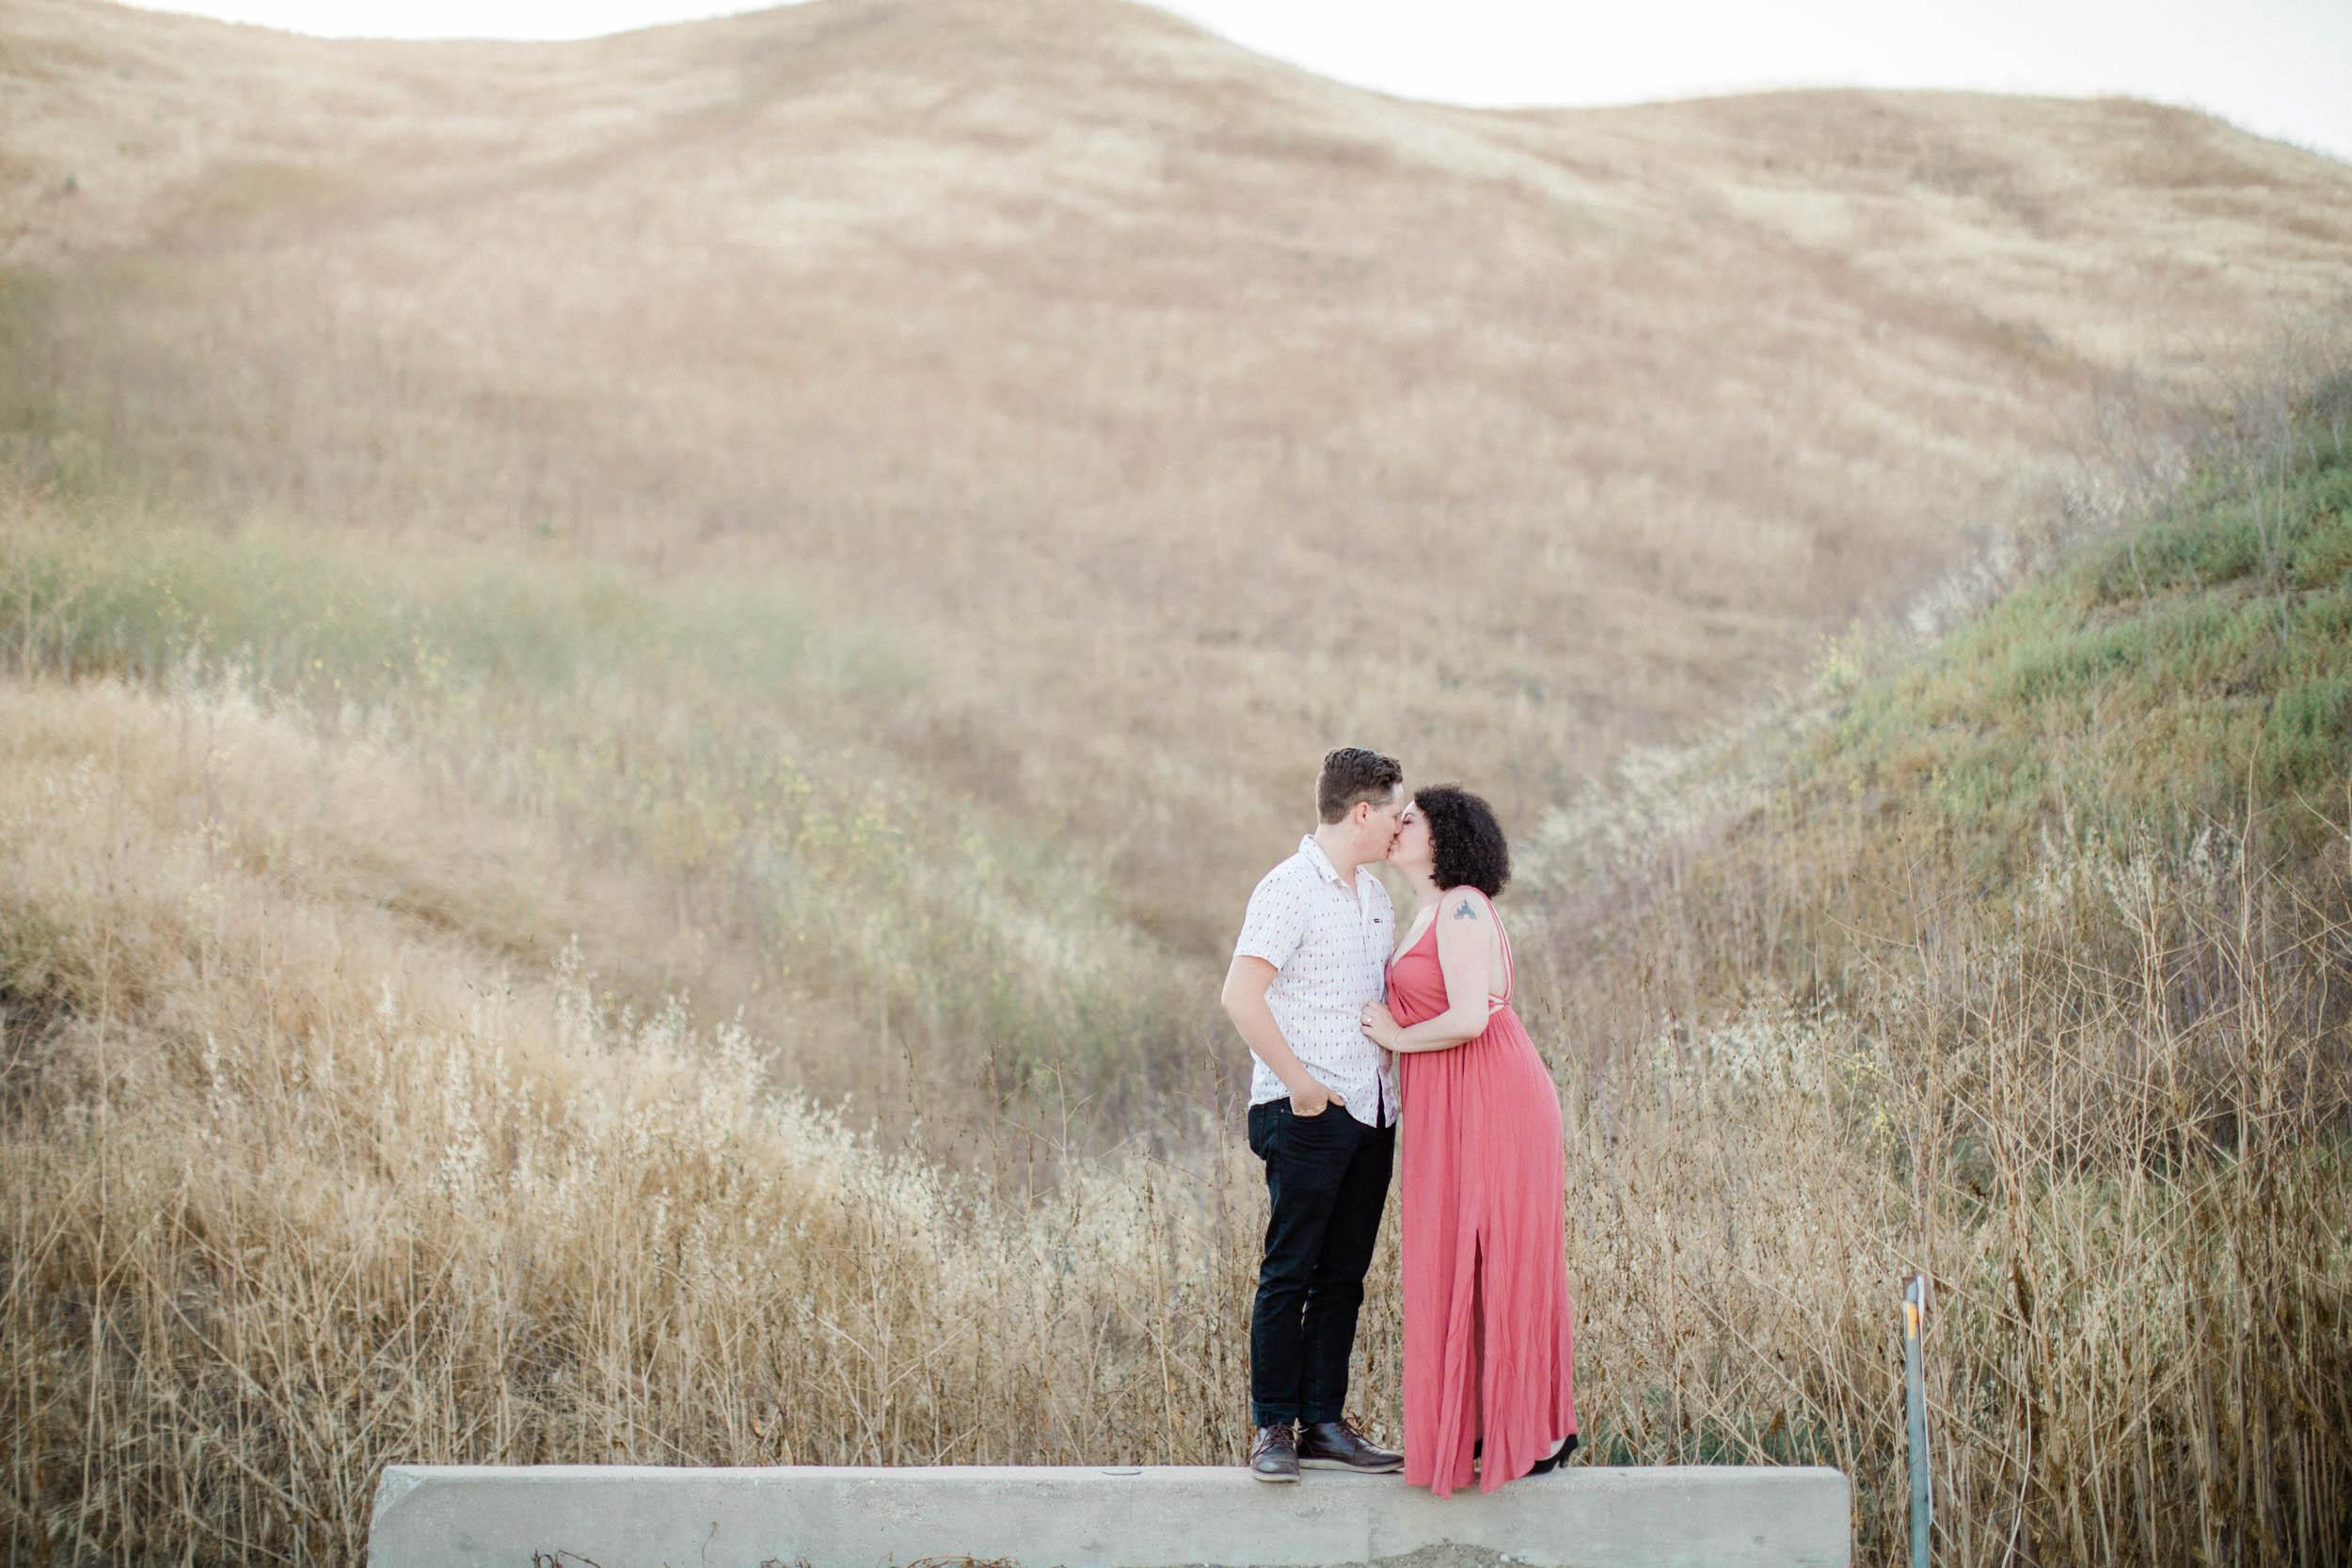 BKM-Photography-Ventura-Southern-California-Engagement-Wedding-0026.jpg